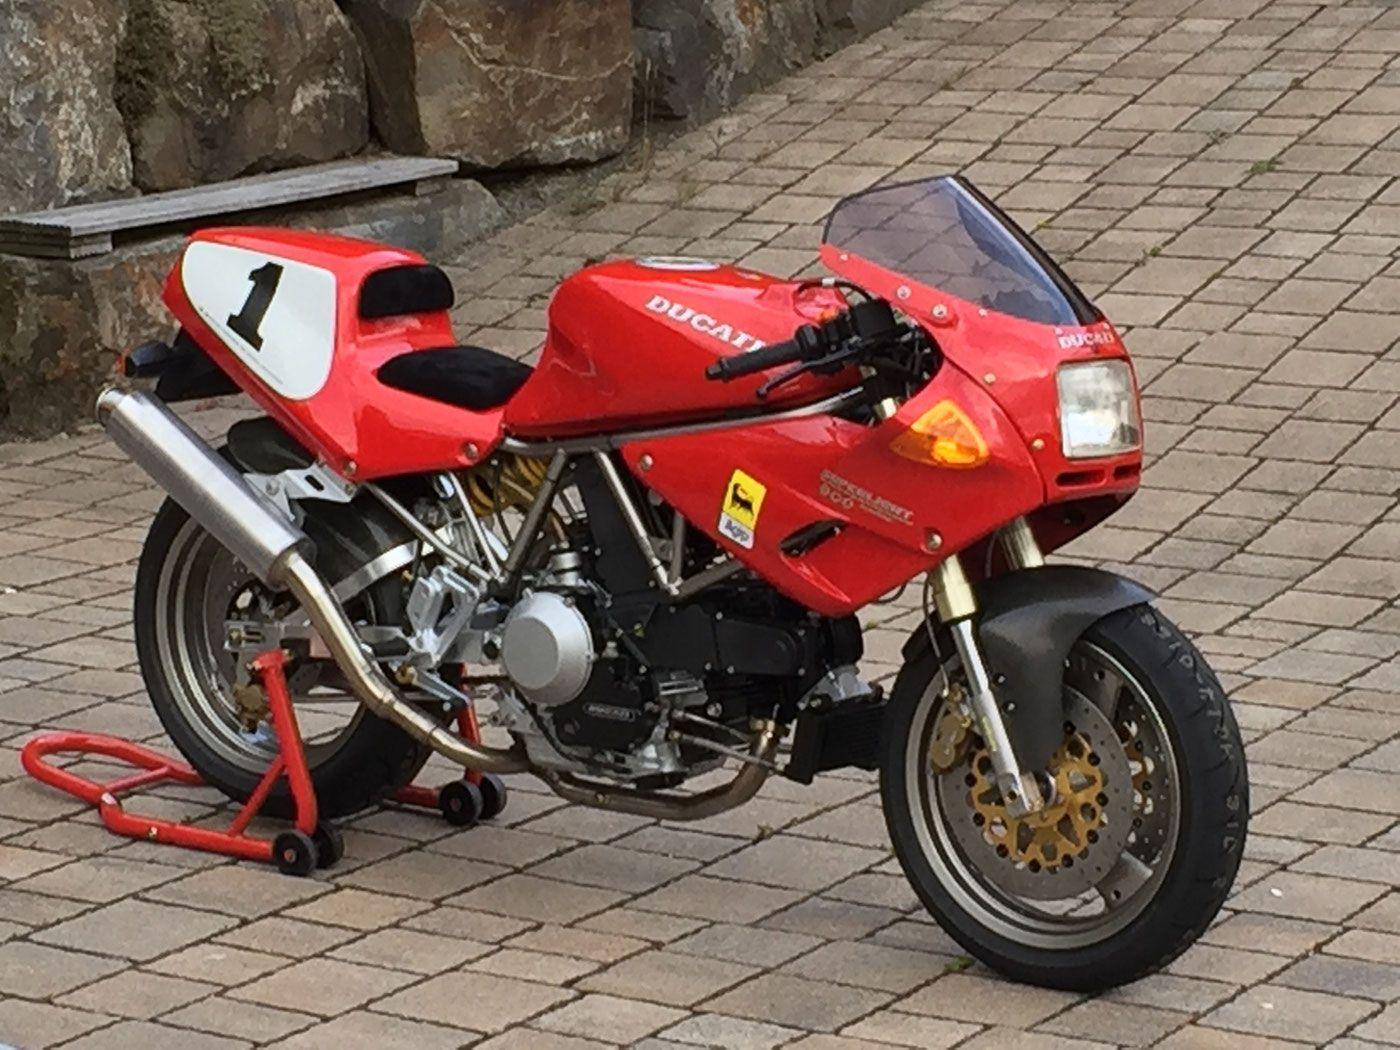 Ducati 900 Superlight Mk Ii Ducati Cafe Racer Ducati Motorbike